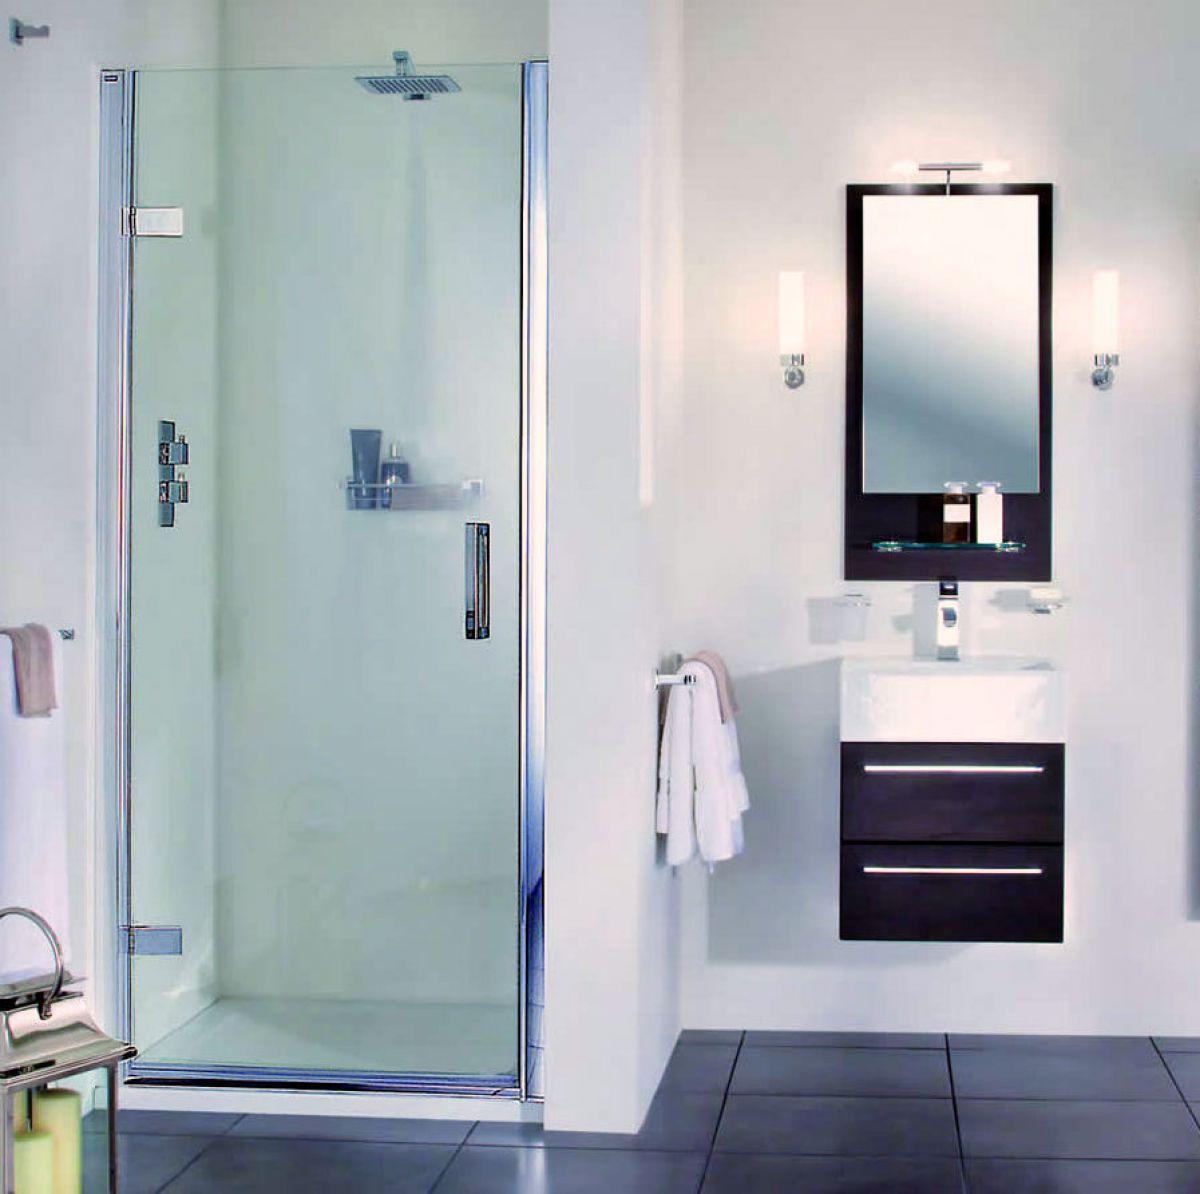 Aqata Spectra Hinged Door Shower Enclosure SP455 (Recess) : UK Bathrooms